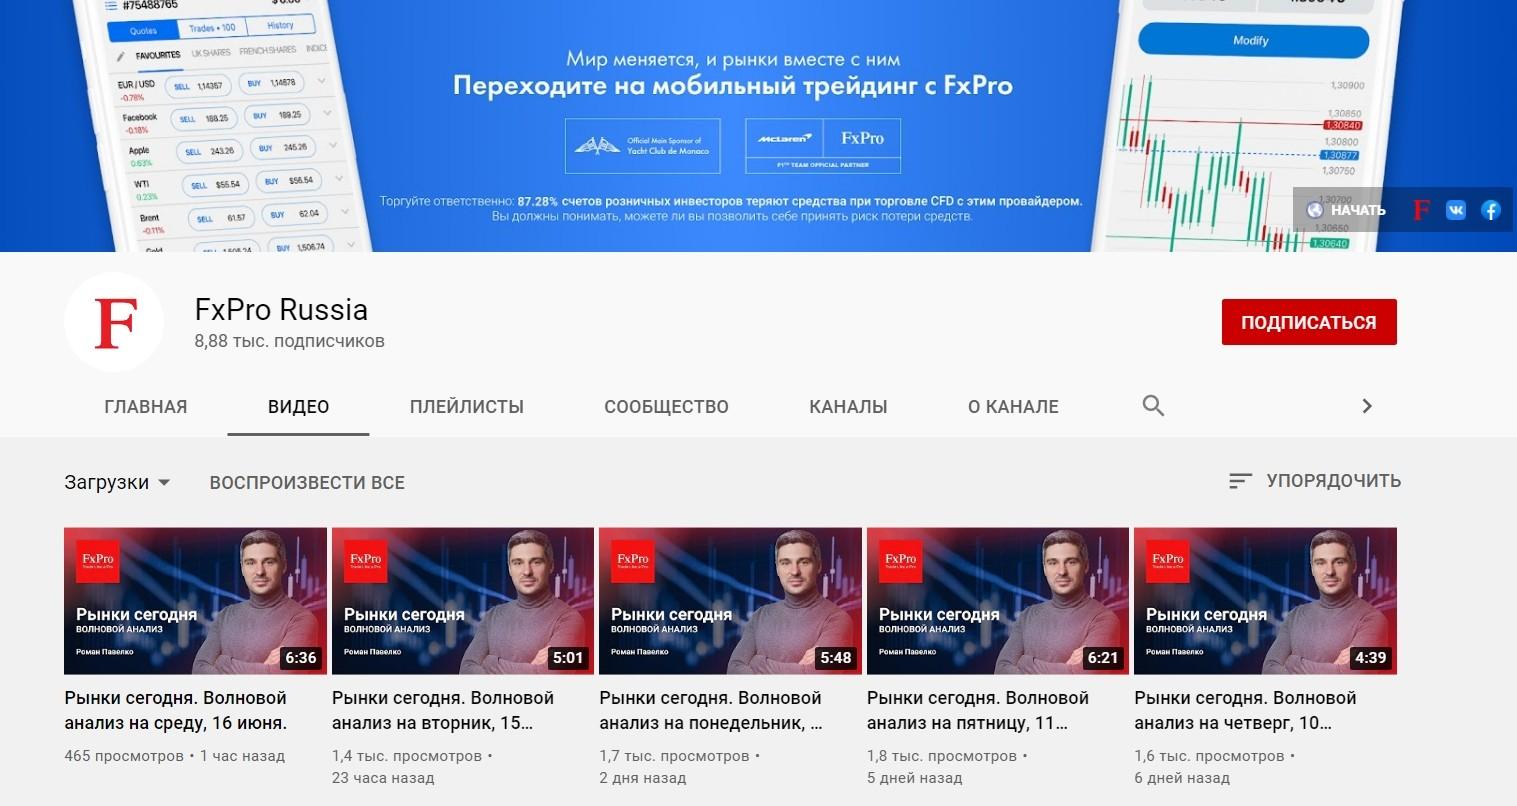 Ютуб канал FxPro